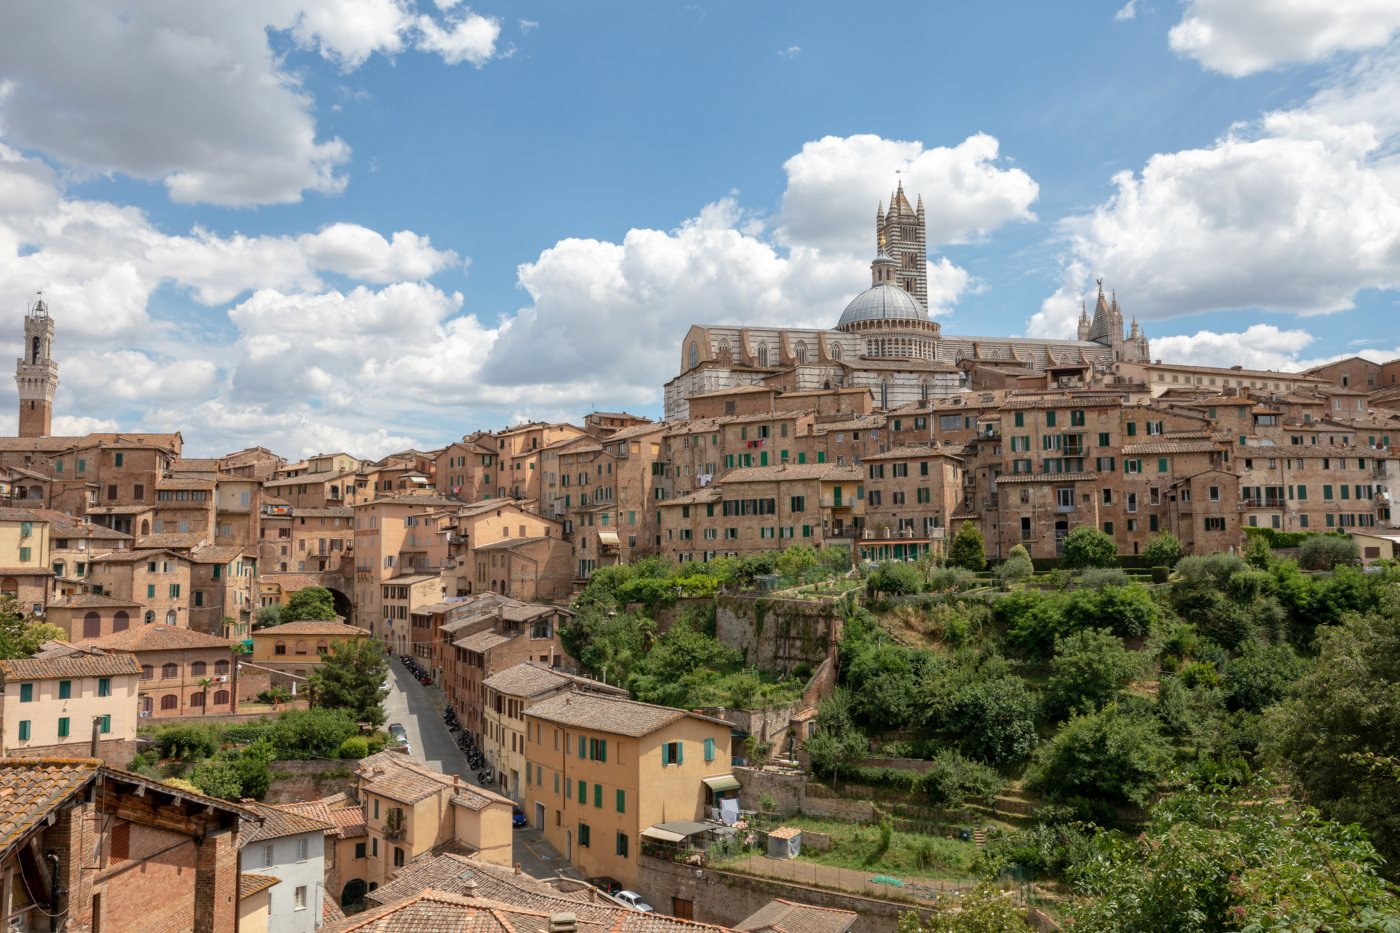 paisagem de Siena